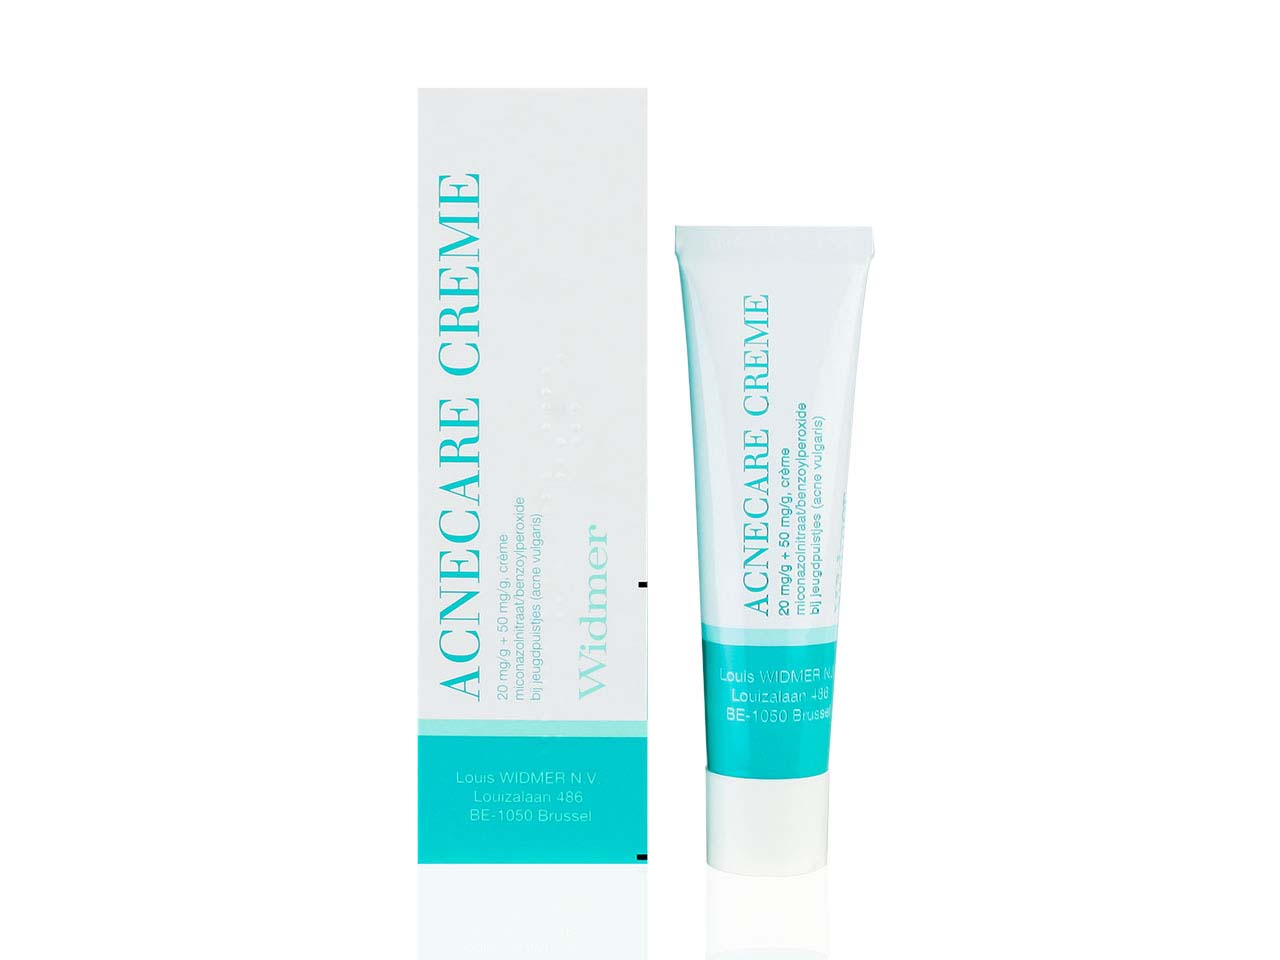 louis widmer acne care